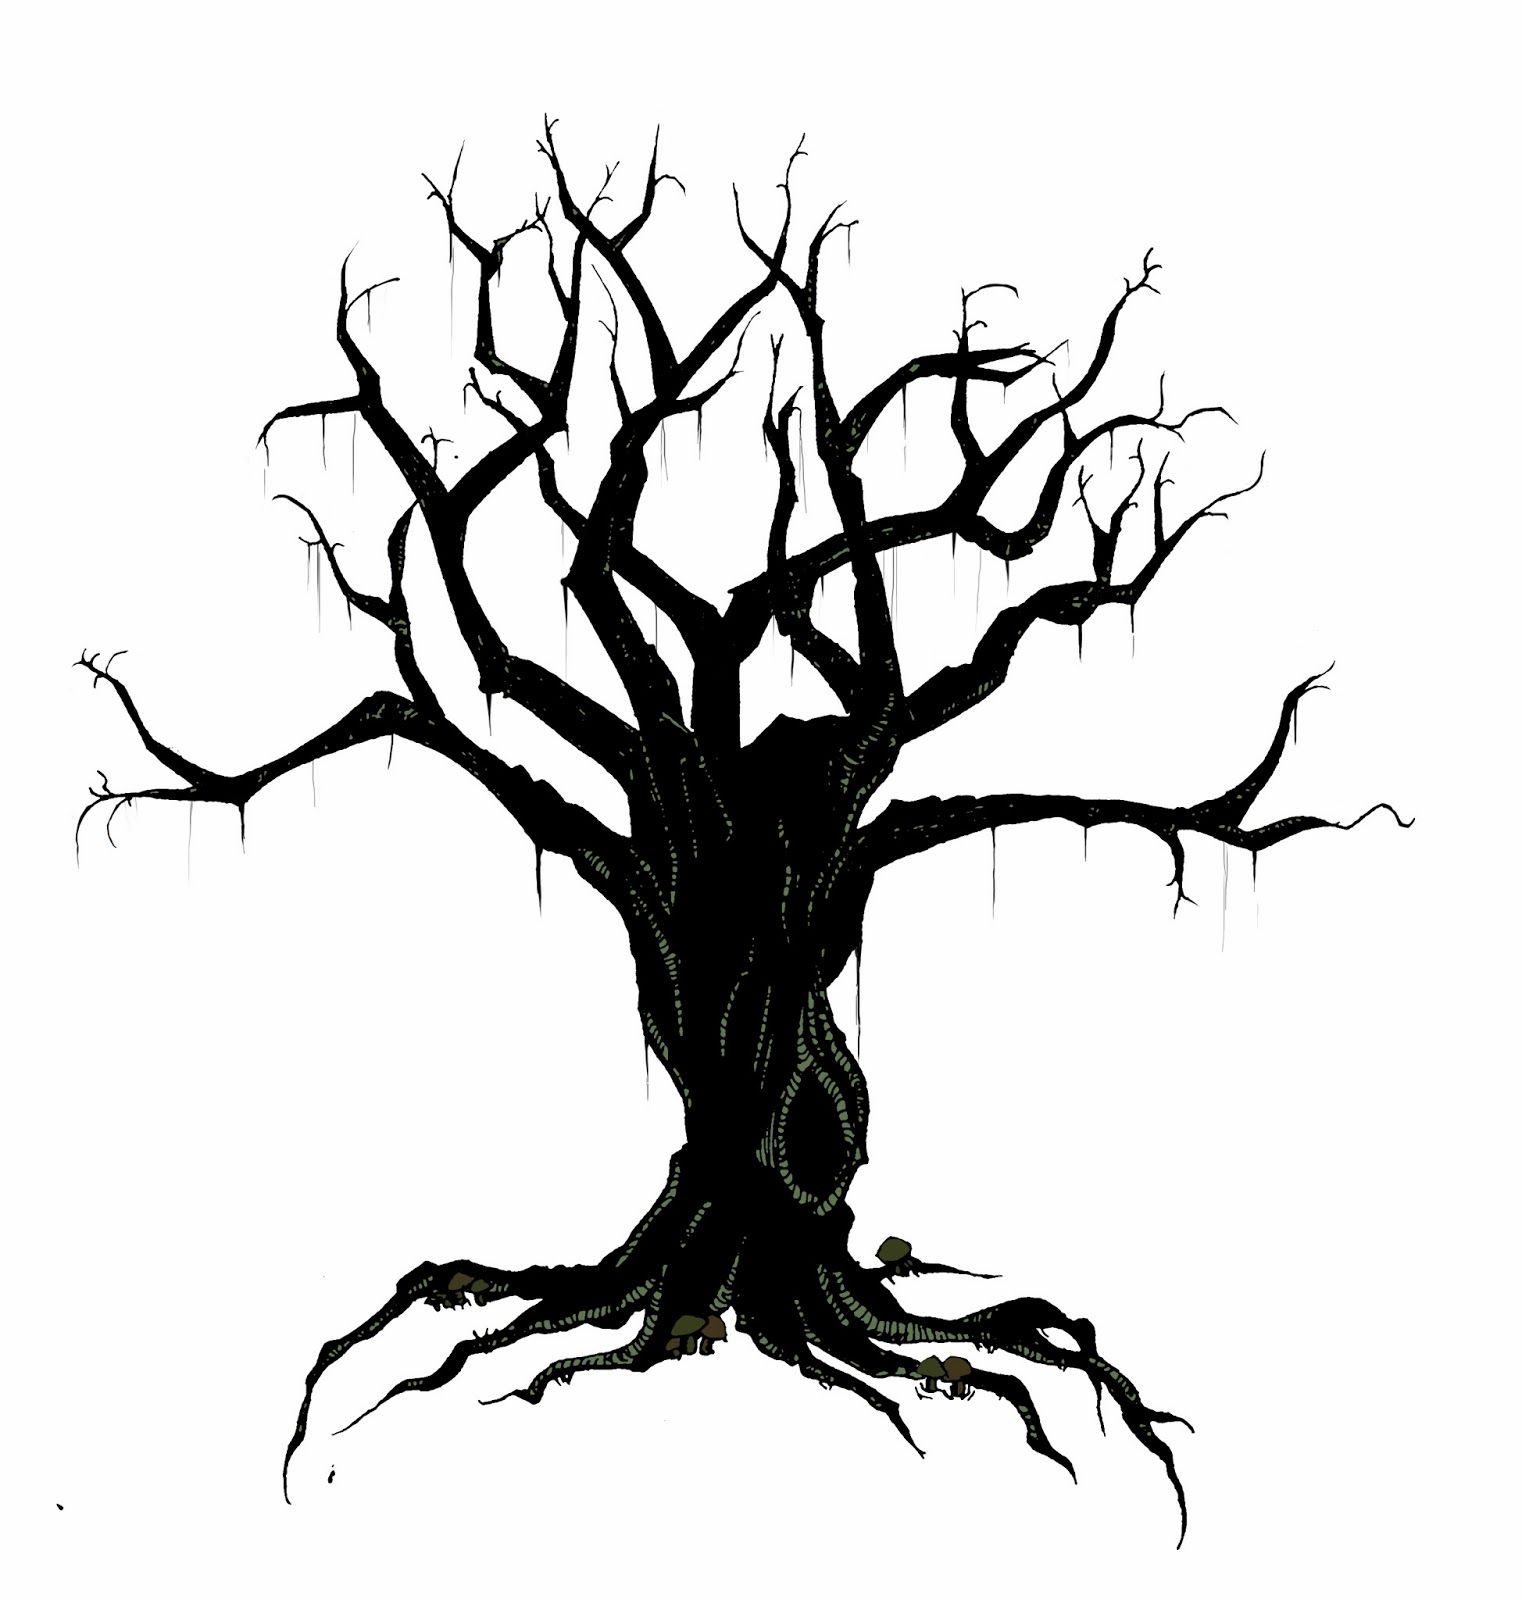 creepy bird in tree silhouette creepy tree ravens